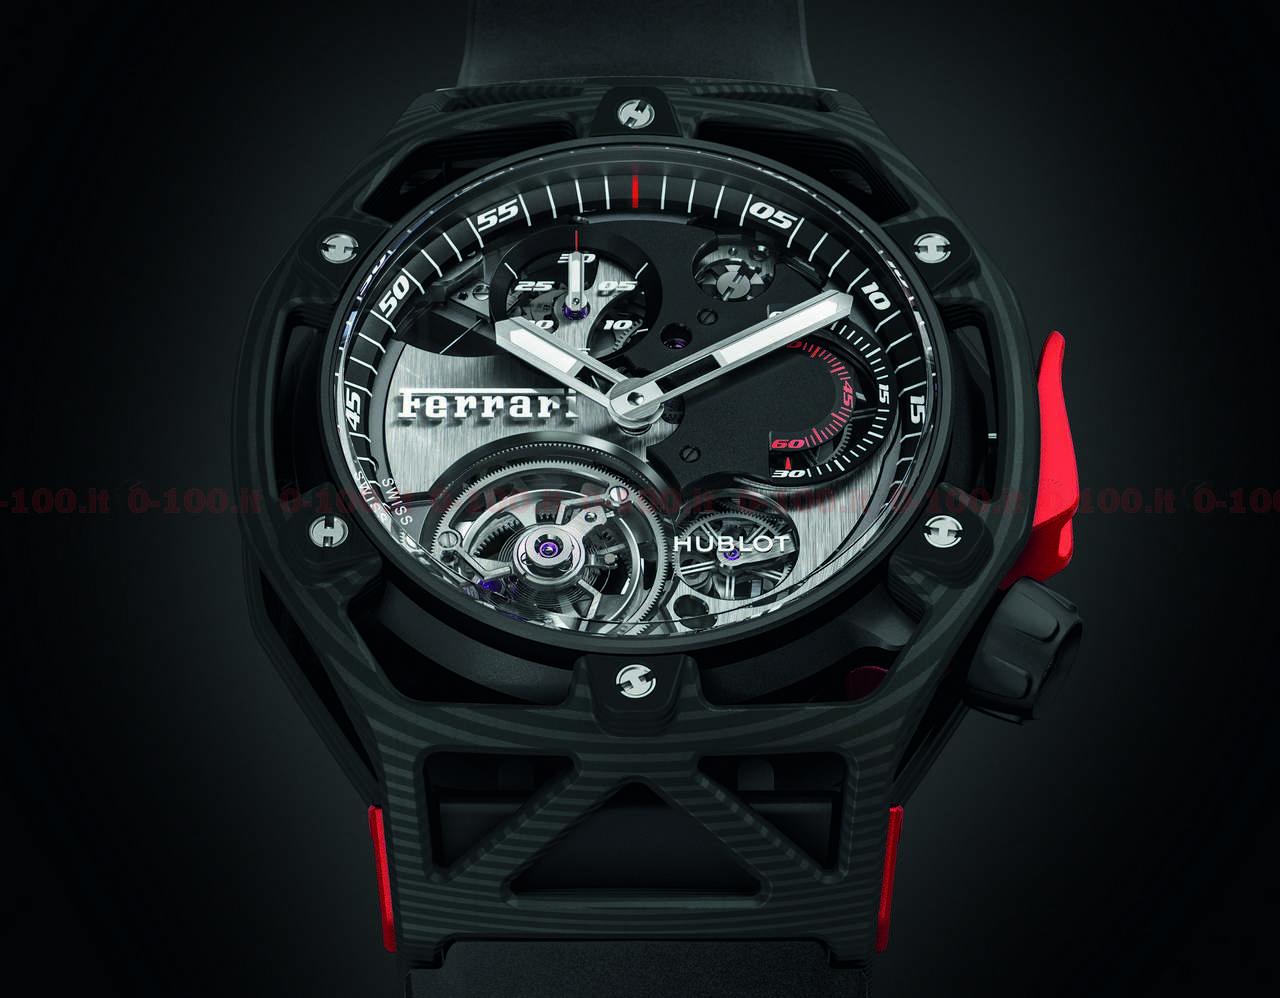 Hublot Techframe Ferrari 70 Years Tourbillon Chronograph Limited Edition_prezzo_price_0-1007